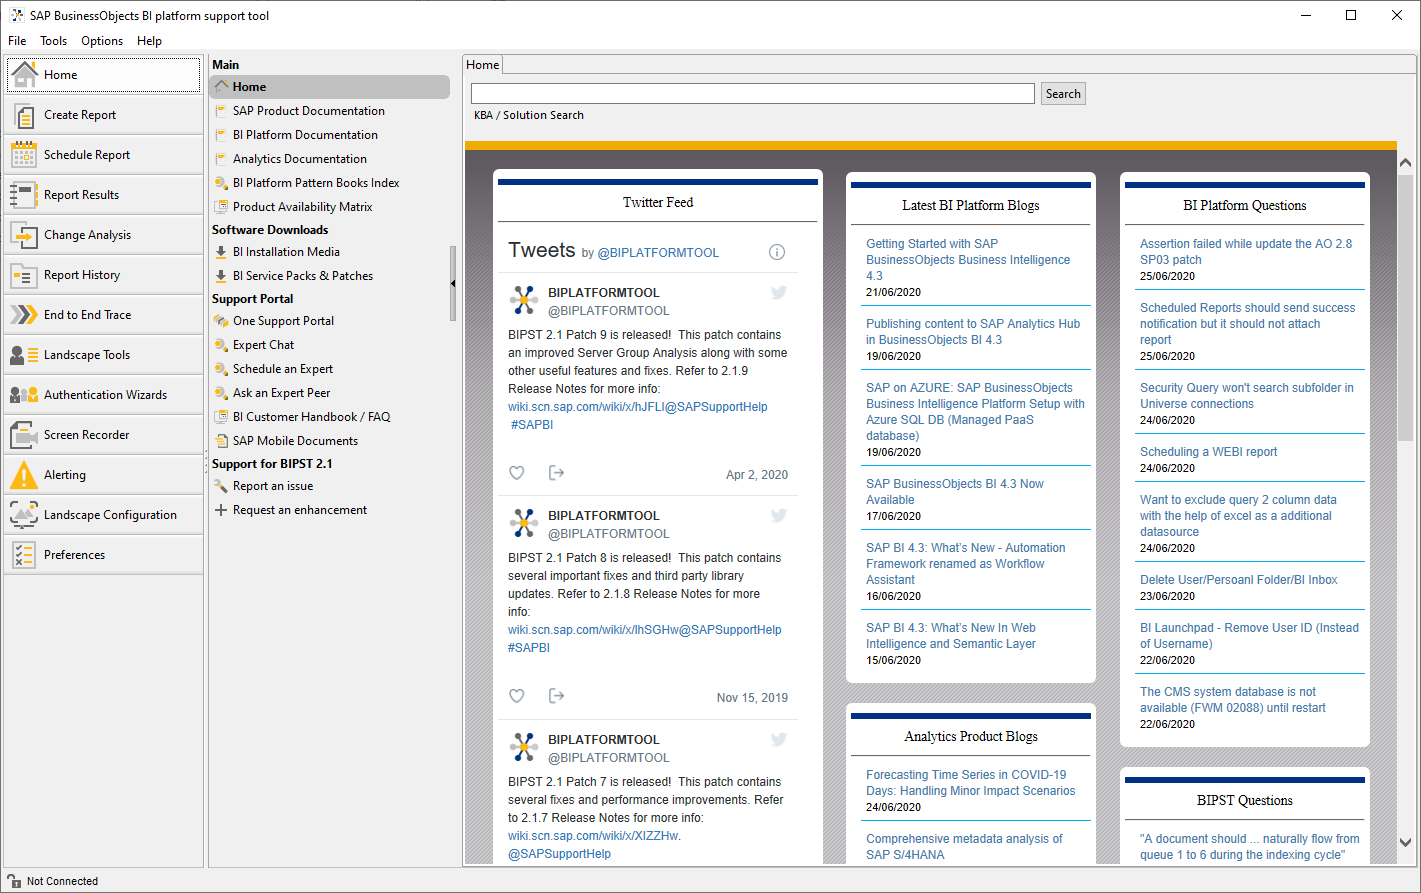 SAP BI Platform Support Tool